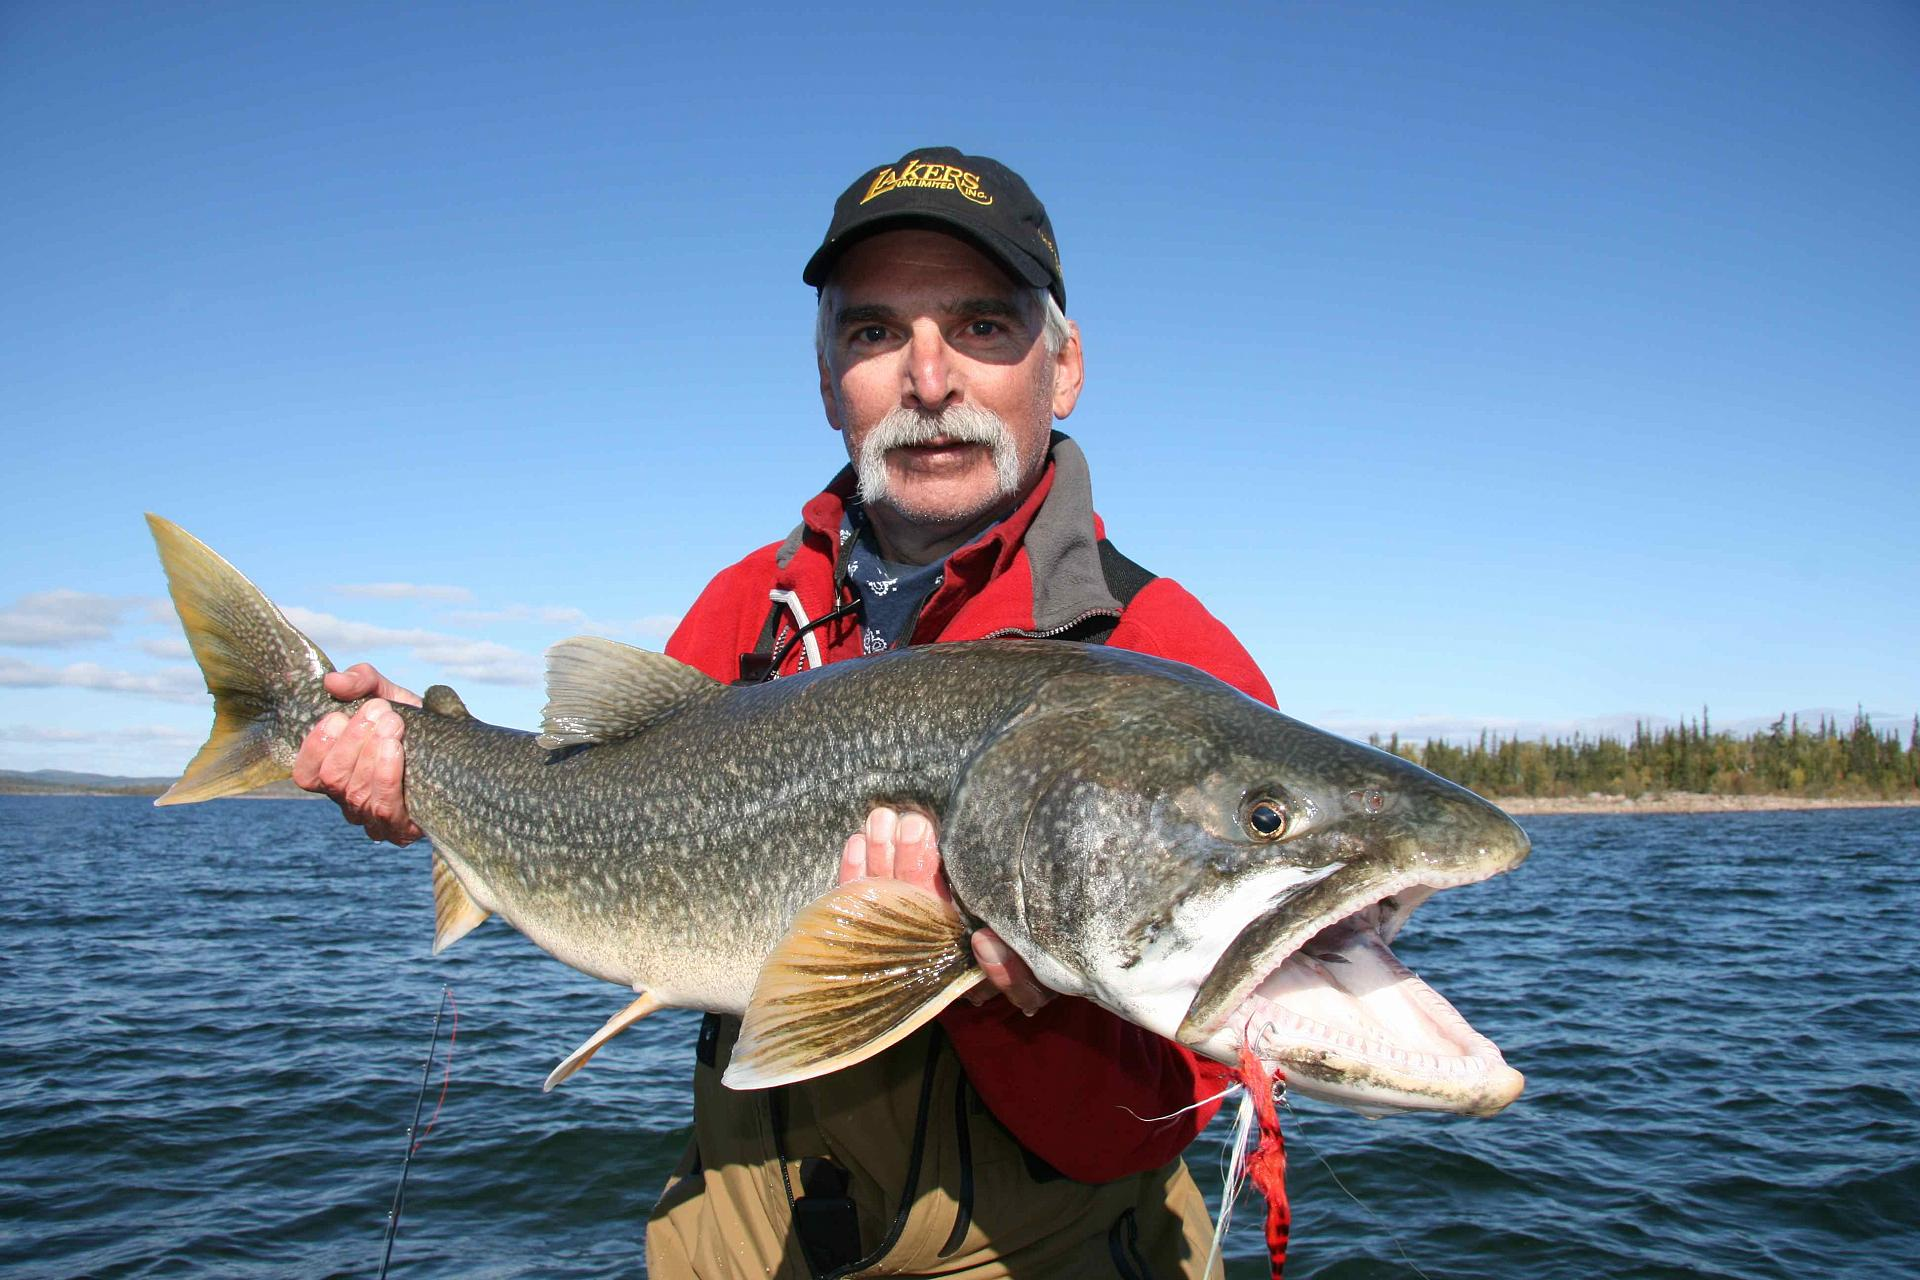 Nice fish: John Cleveland hoists his big fish of day 3